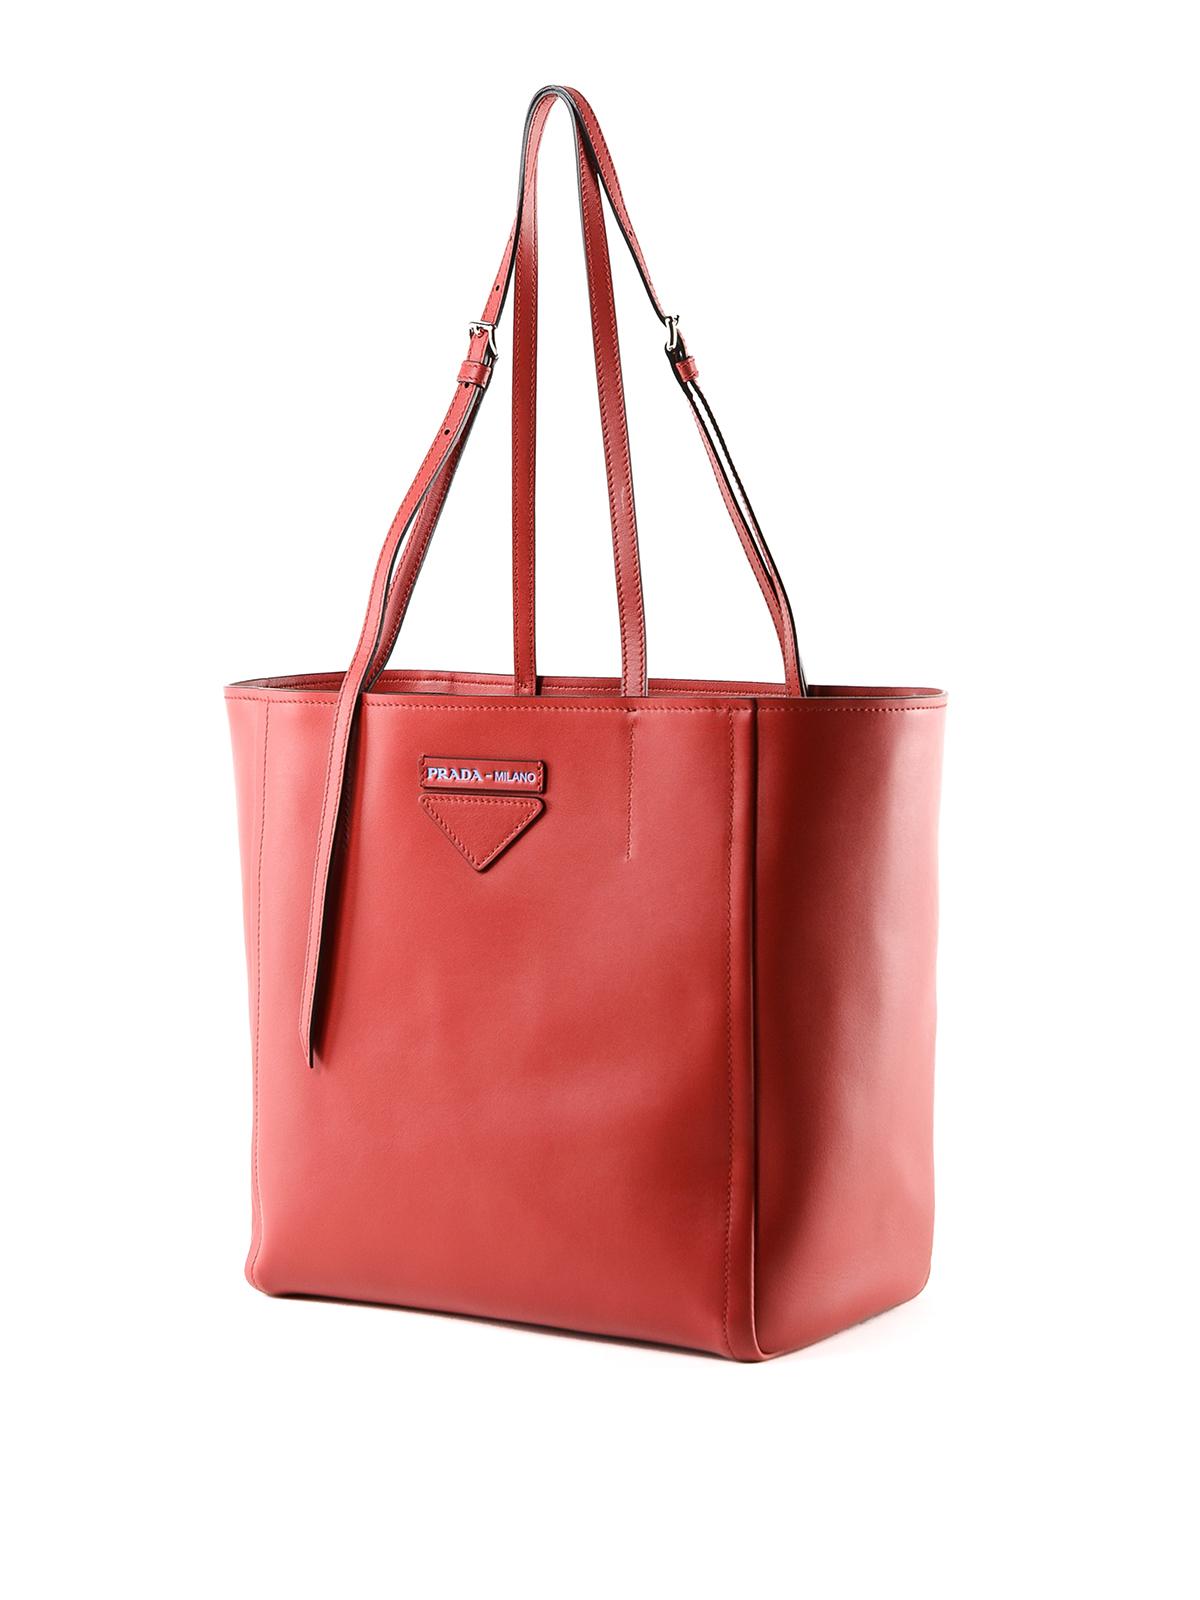 2dc83ab14431 Prada - Concept small red leather tote bag - totes bags - 1BG2092B2J CF5